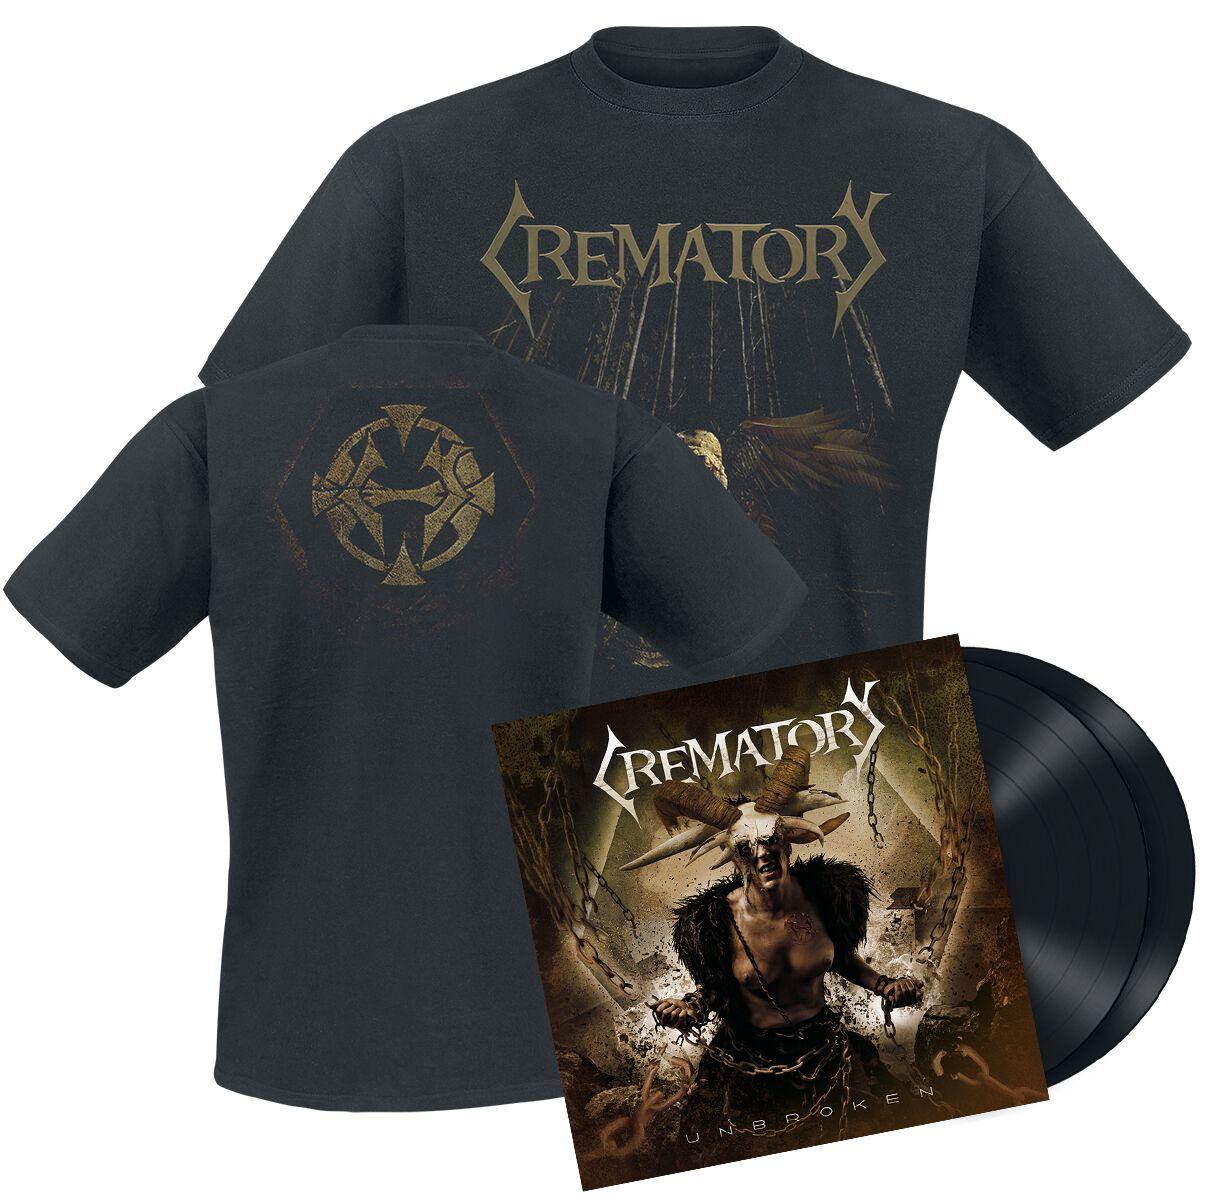 Image of Crematory Unbroken 2-LP & T-Shirt Standard